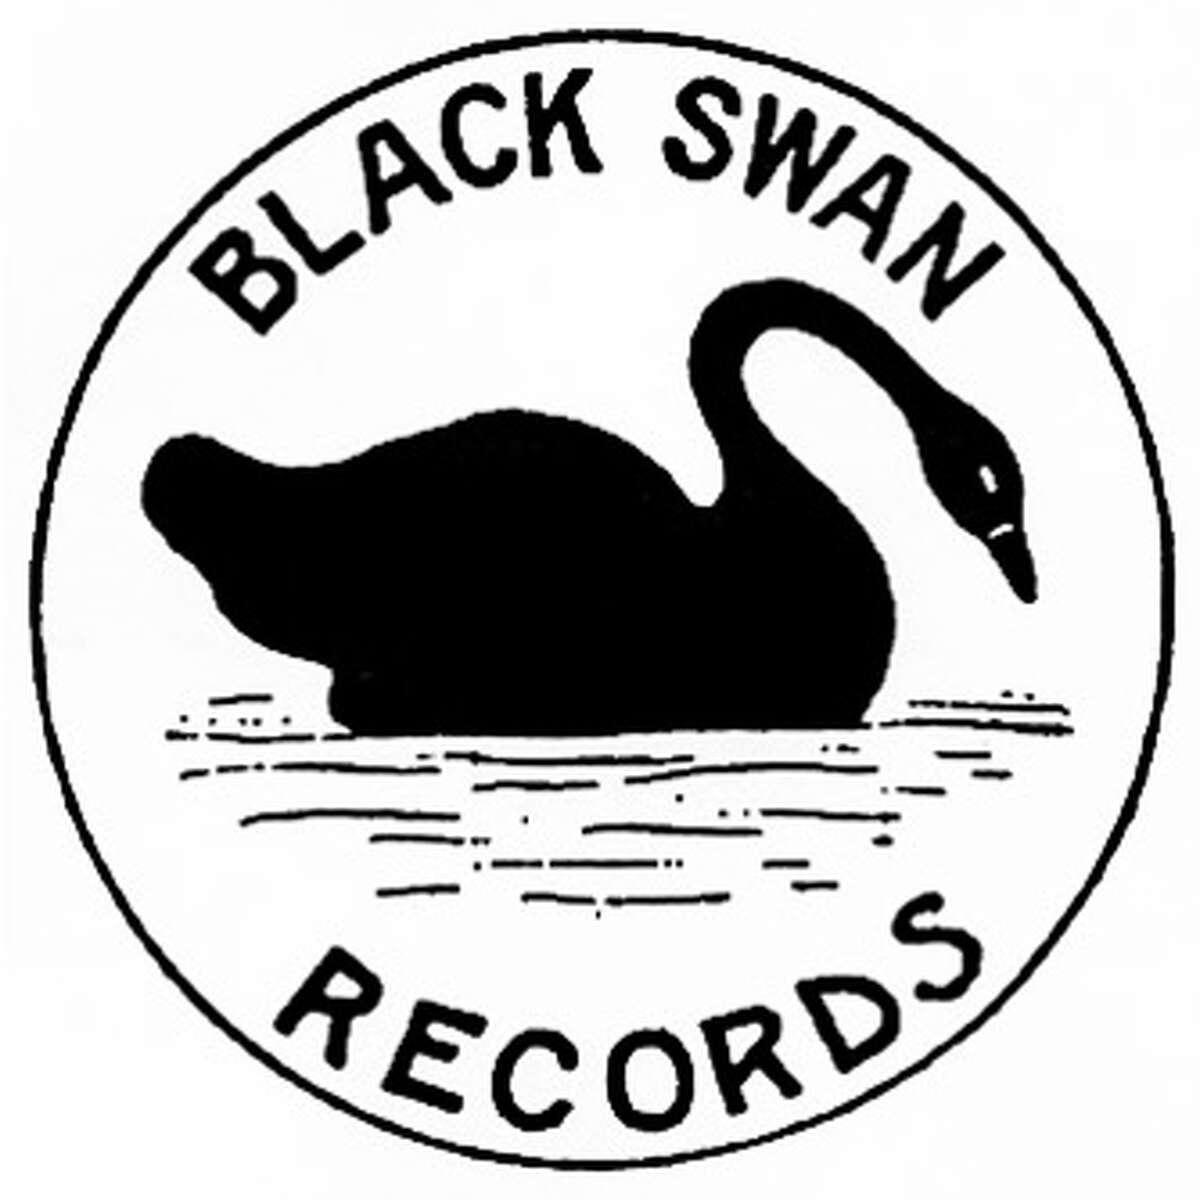 Black Swan Records